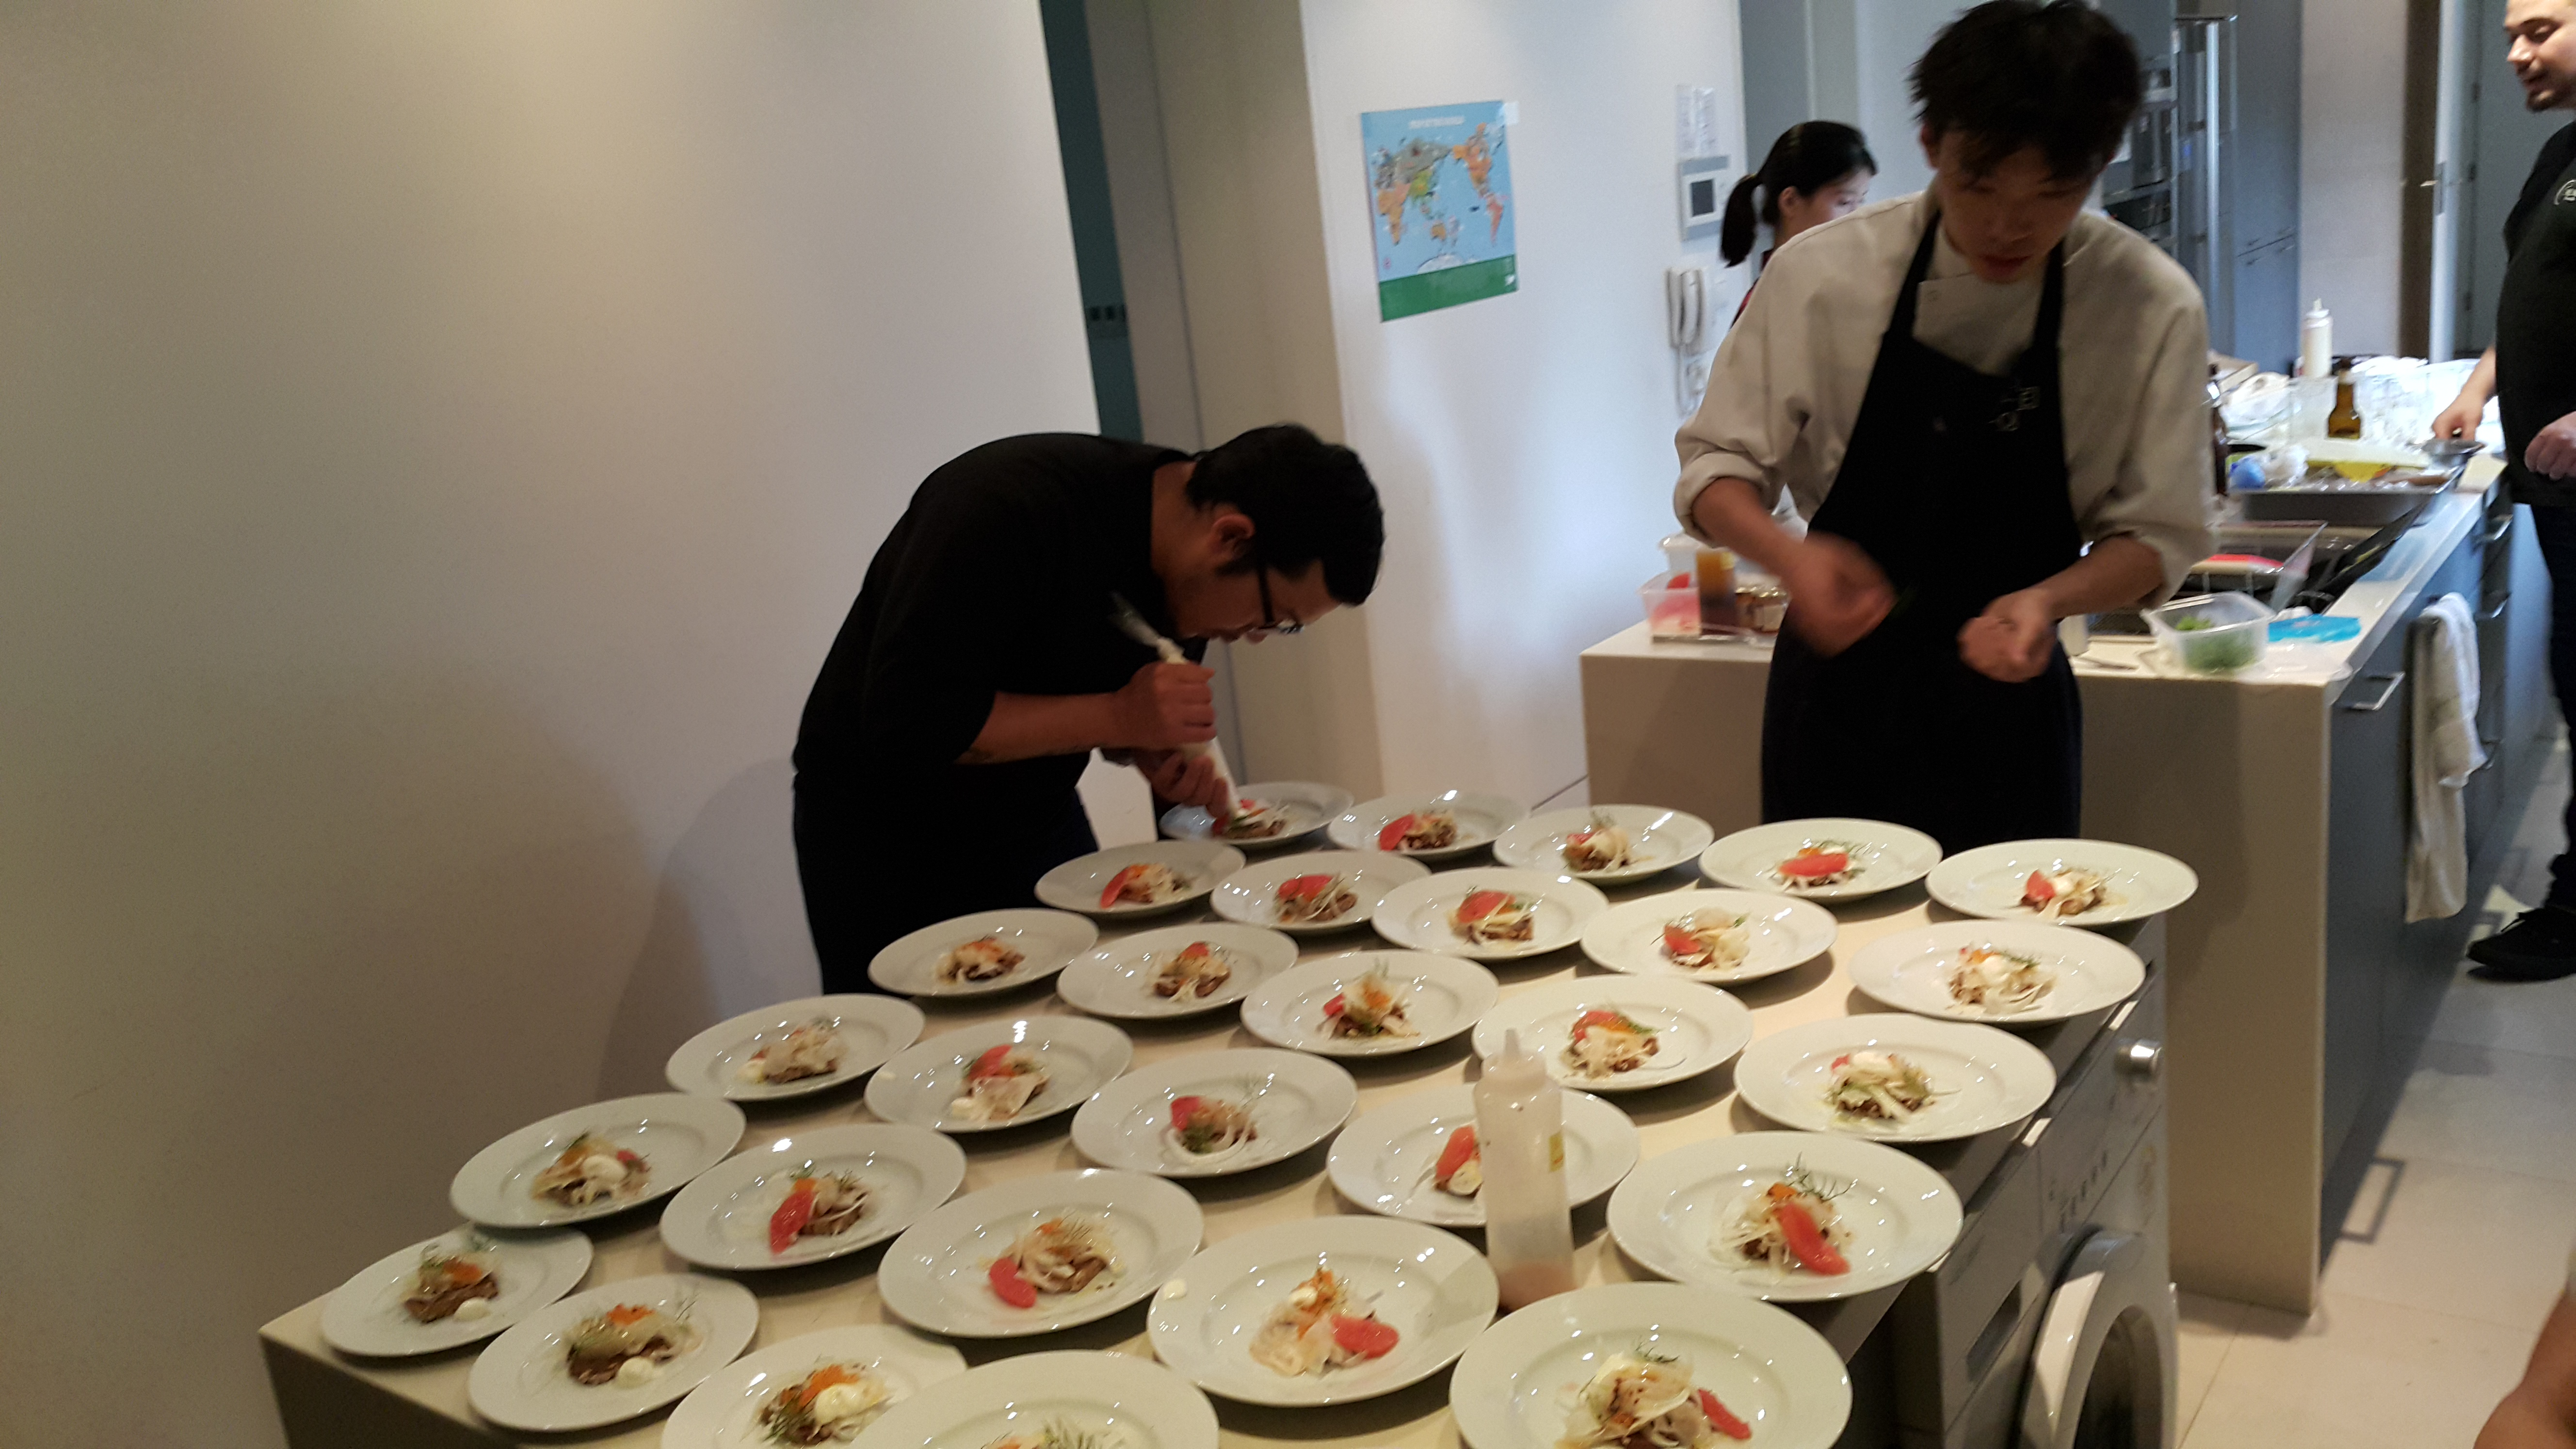 Terreno's Chef Carlos Shin Plating